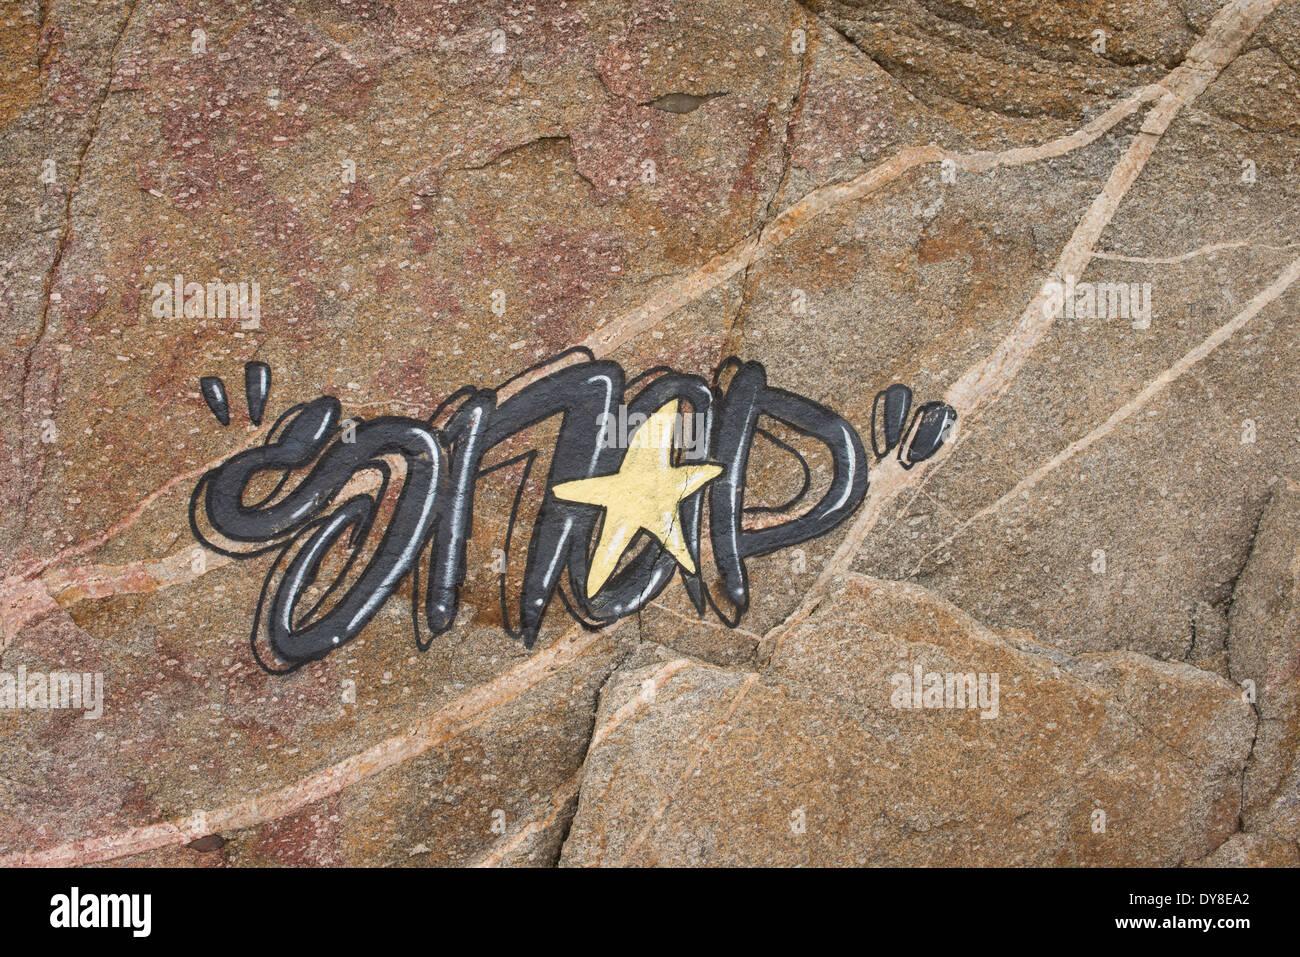 Artista callejero de firmas en roca arenisca, España Imagen De Stock